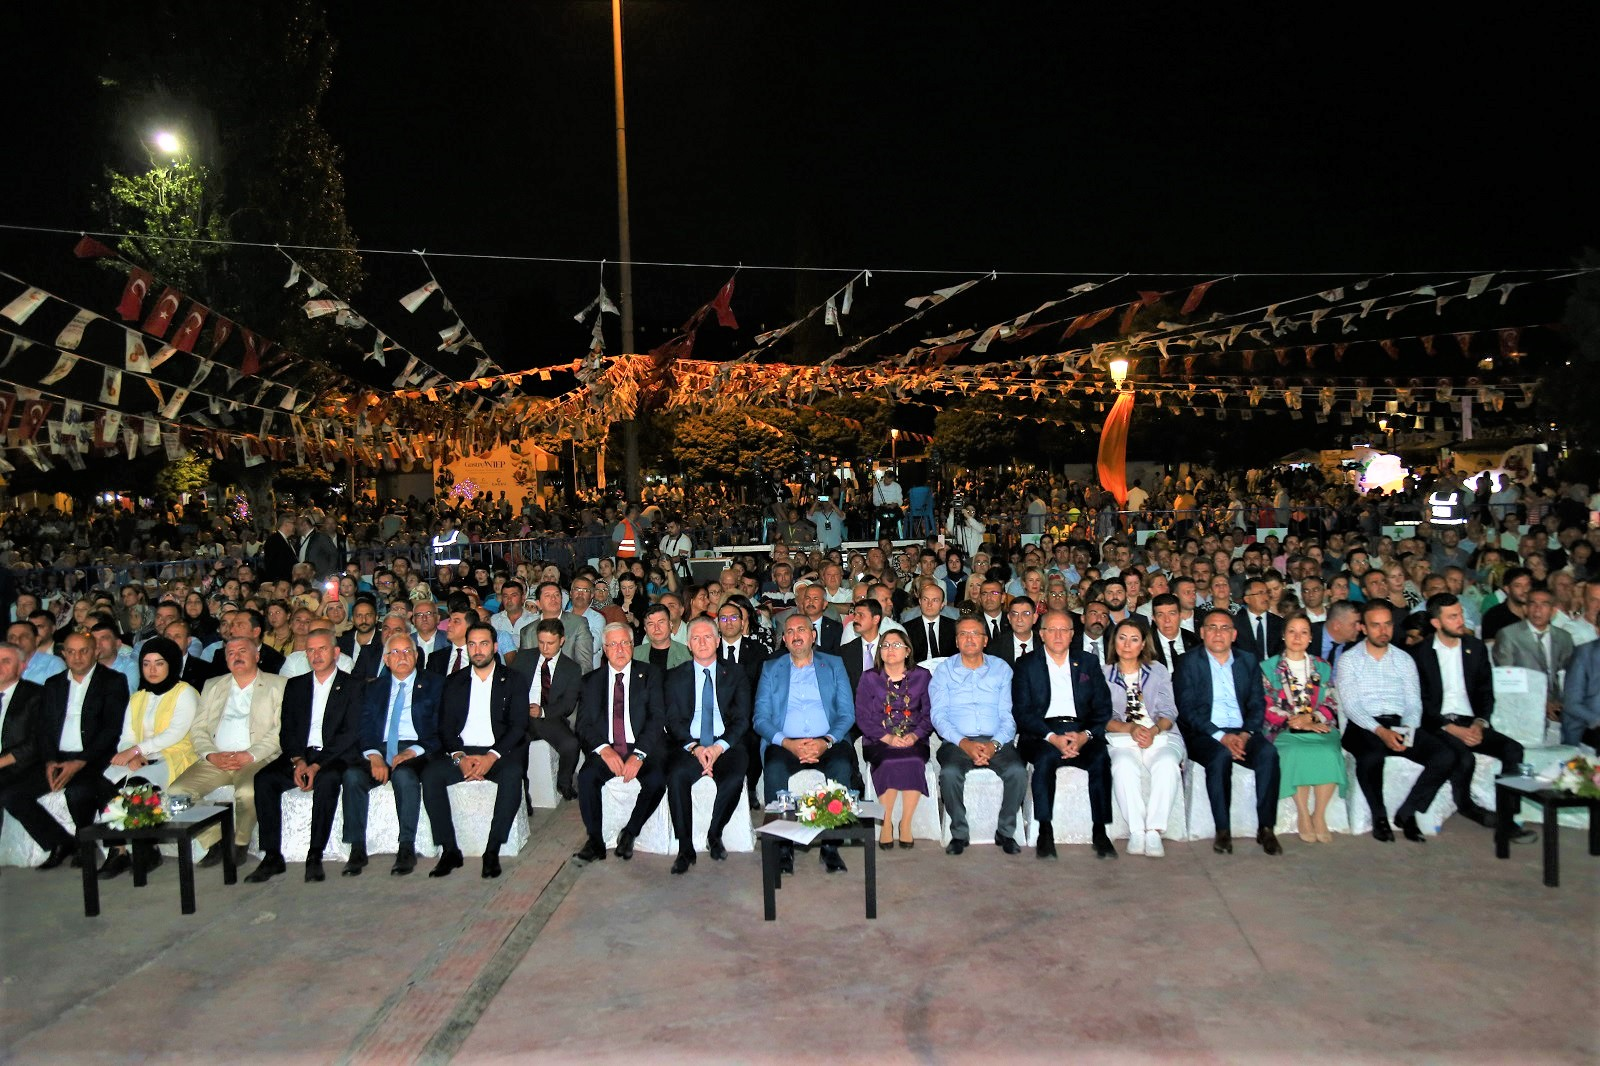 gastroantep-festivali-gaziantep'e-cok-yakisti--(6).jpeg